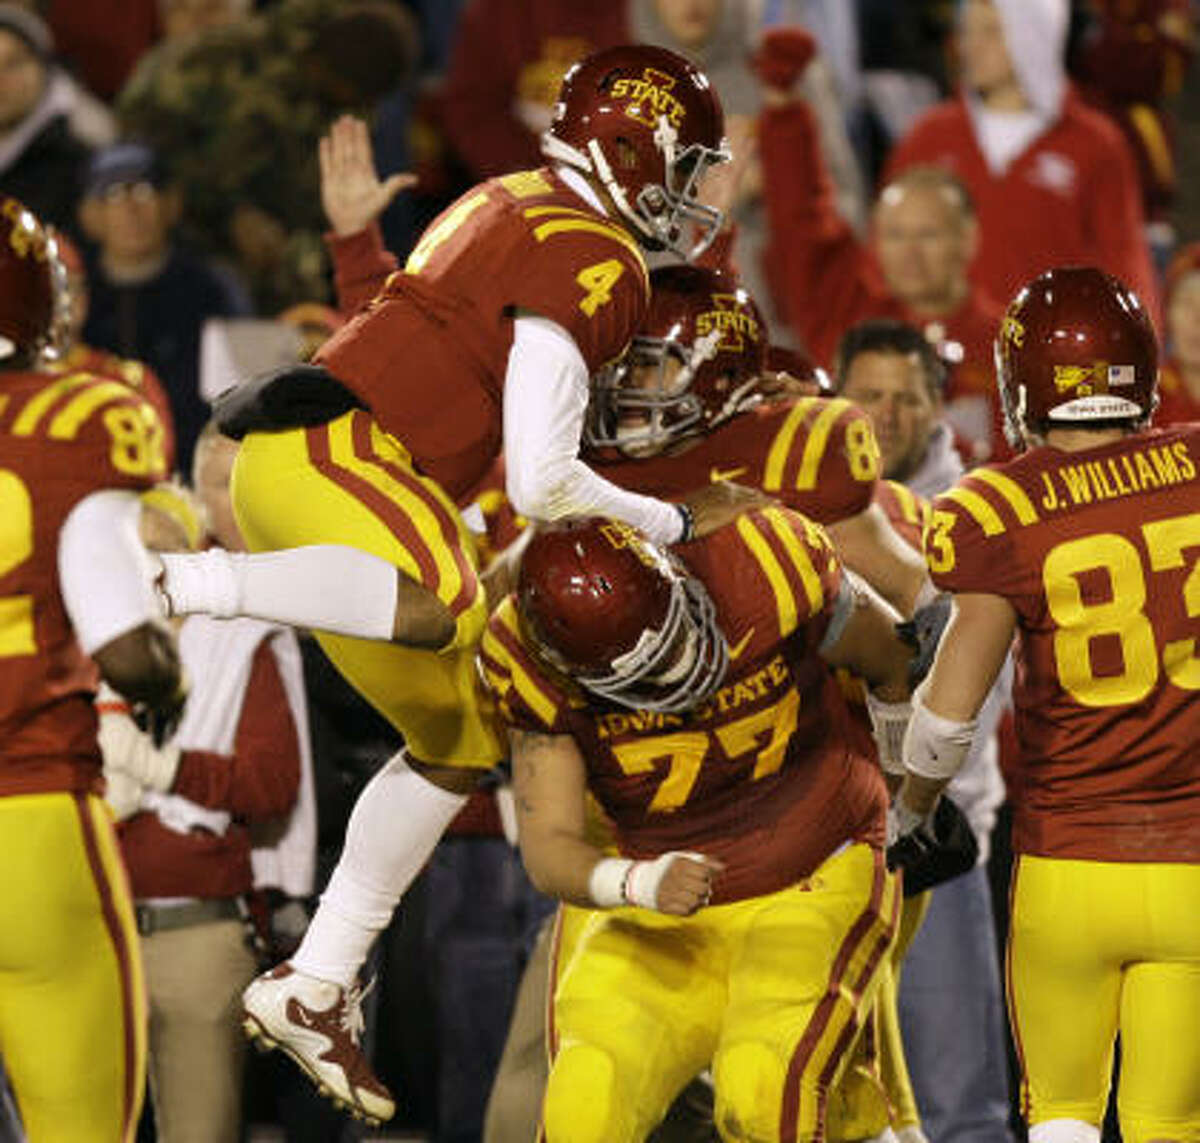 Iowa State quarterback Austen Arnaud (4) celebrates with teammates Derrick Catlett, center, Alex Alvarez (77) and Jake Williams, right, after Cetlett's touchdown reception.